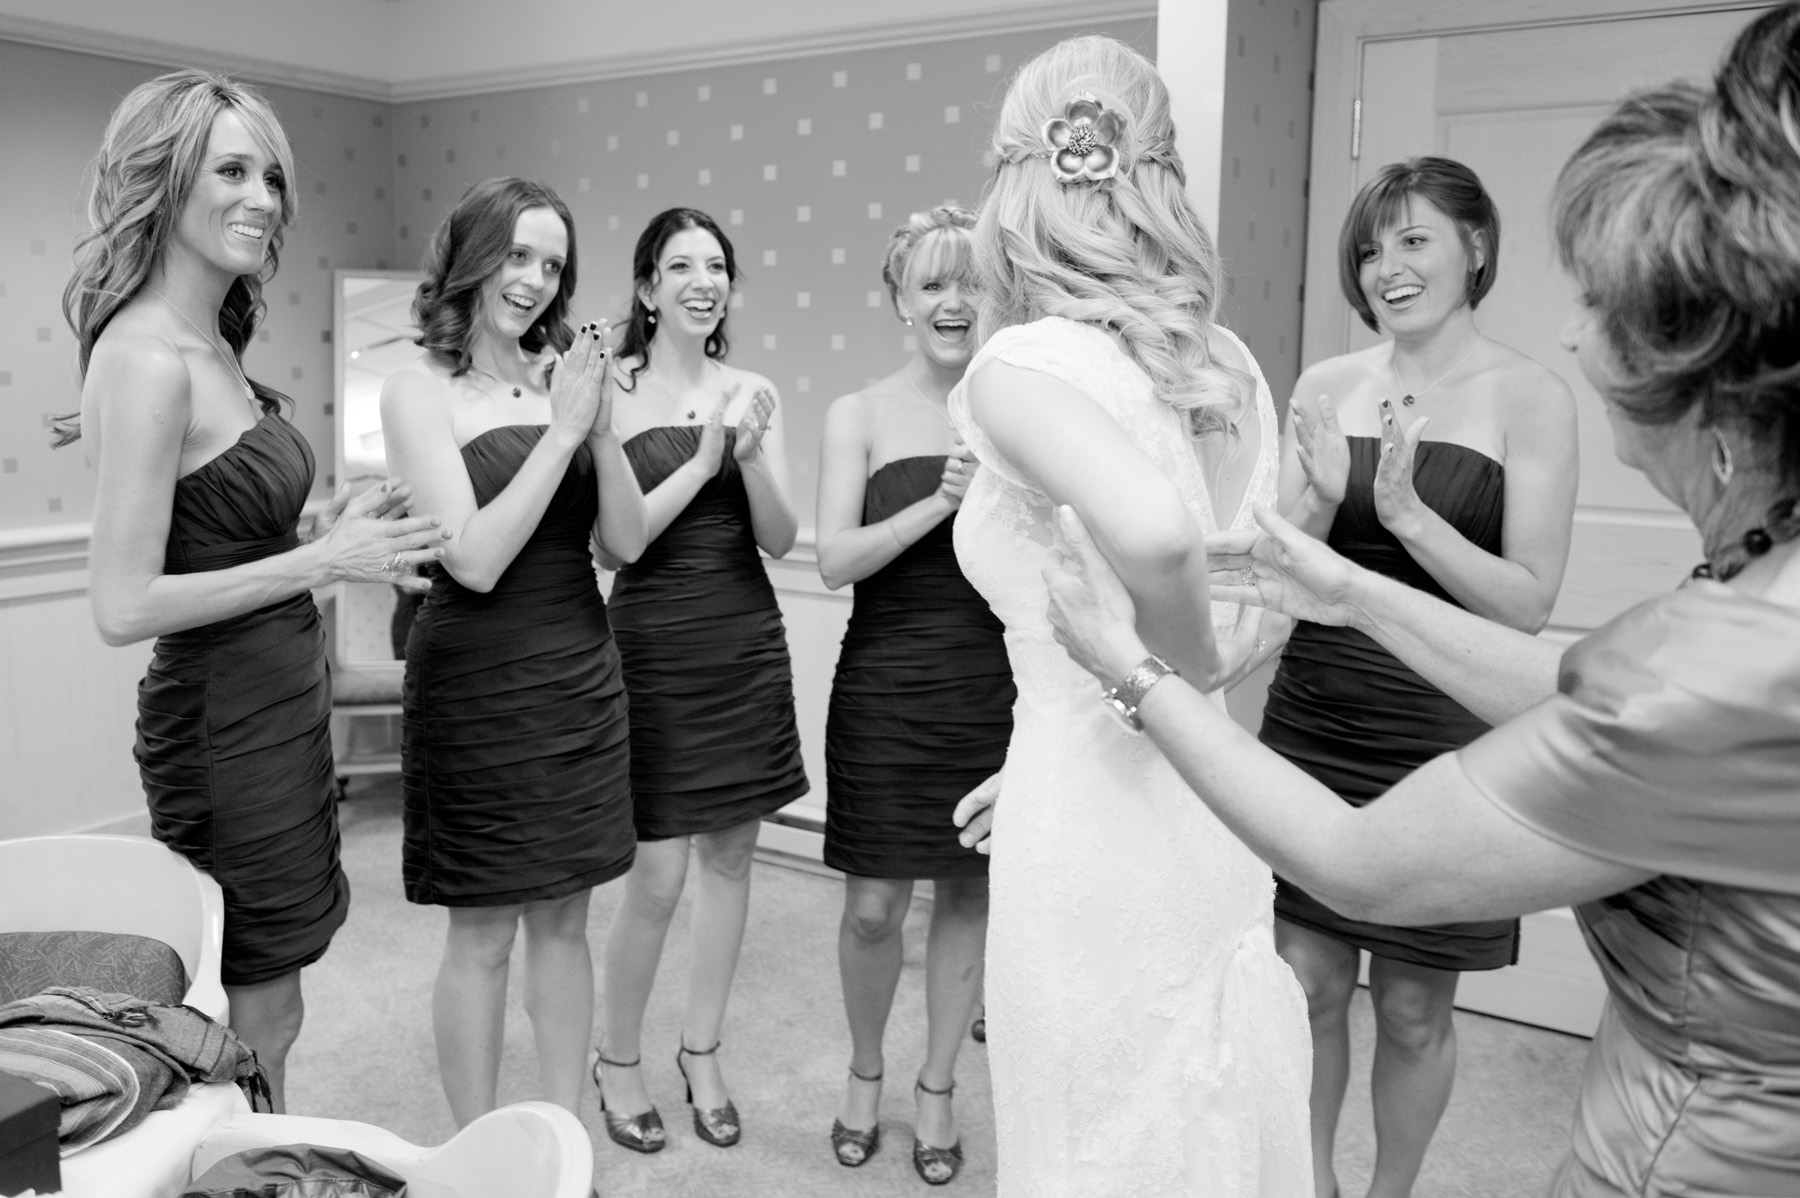 minneapolis-wedding-photography-mark-kegans-316.jpg